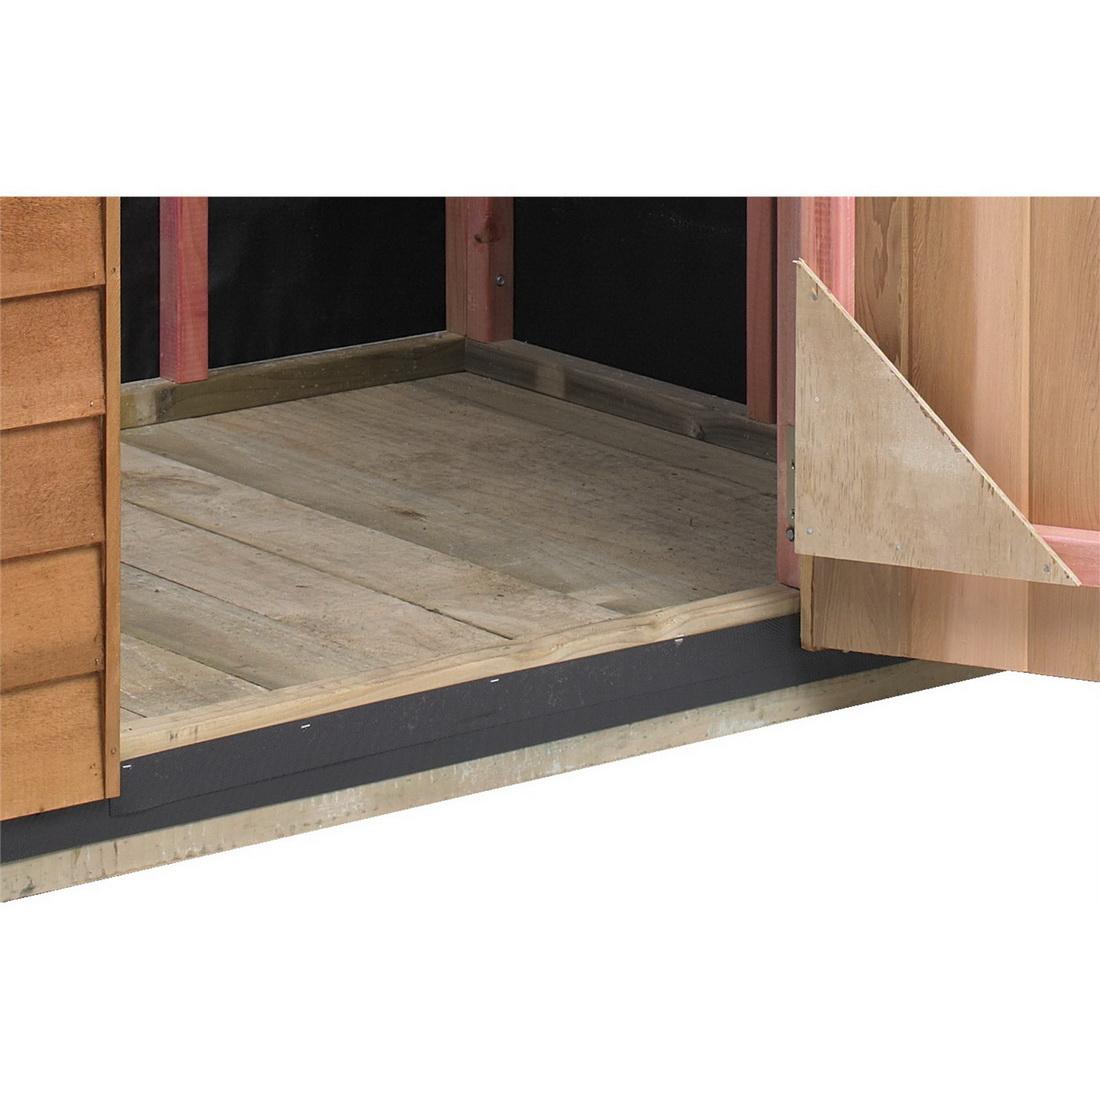 Millbrook Garden Shed Timber Floor Kit